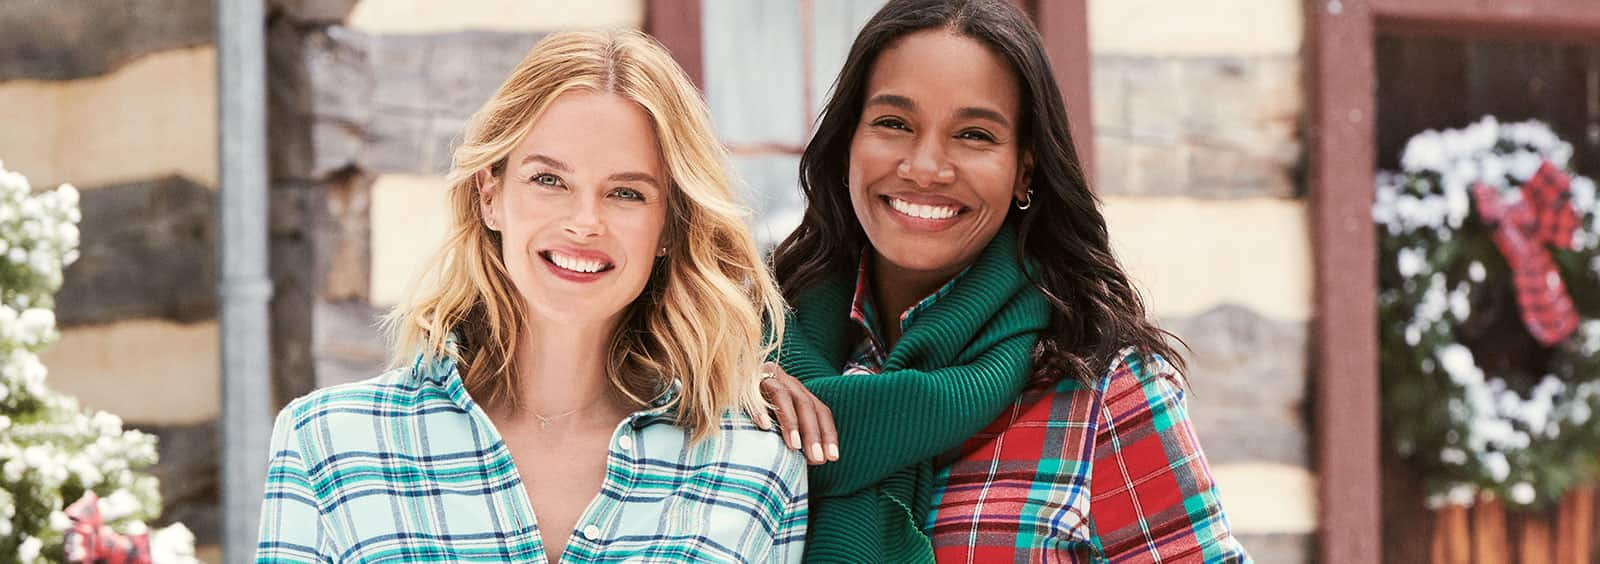 Winter Flannel vs. Summer Flannel: Which Works Best? | Lands' End